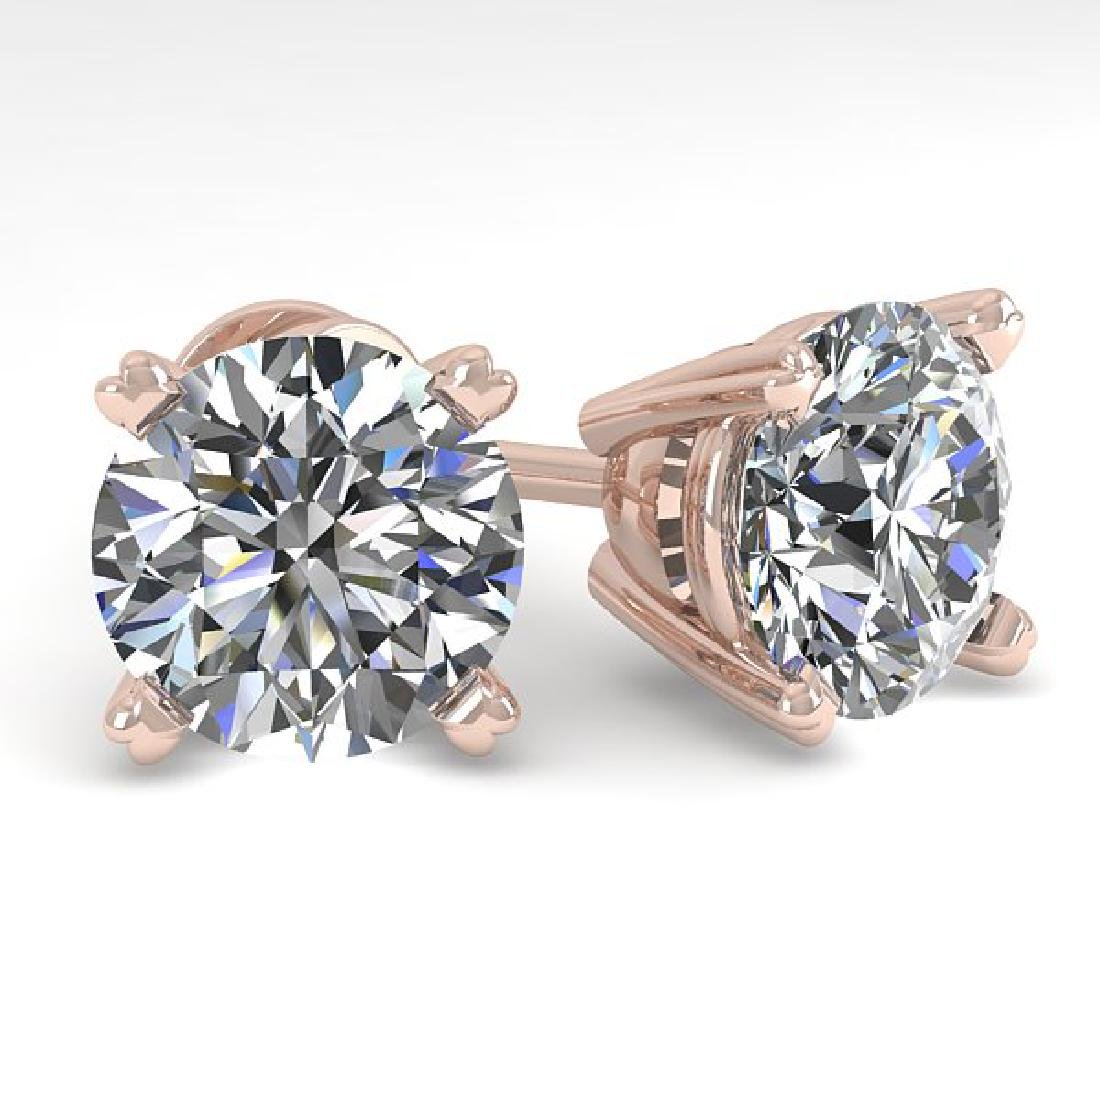 4 CTW Certified VS/SI Diamond Stud Earrings 18K Rose